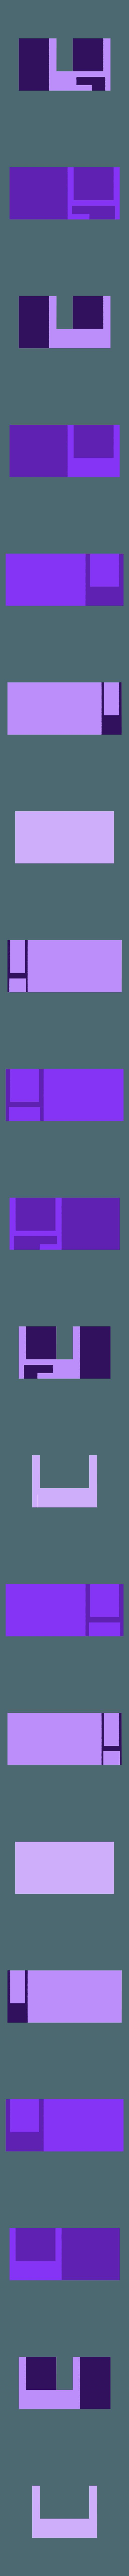 Arduino_Case.stl Download free STL file Arduino Pro Micro • 3D printing object, jeek25